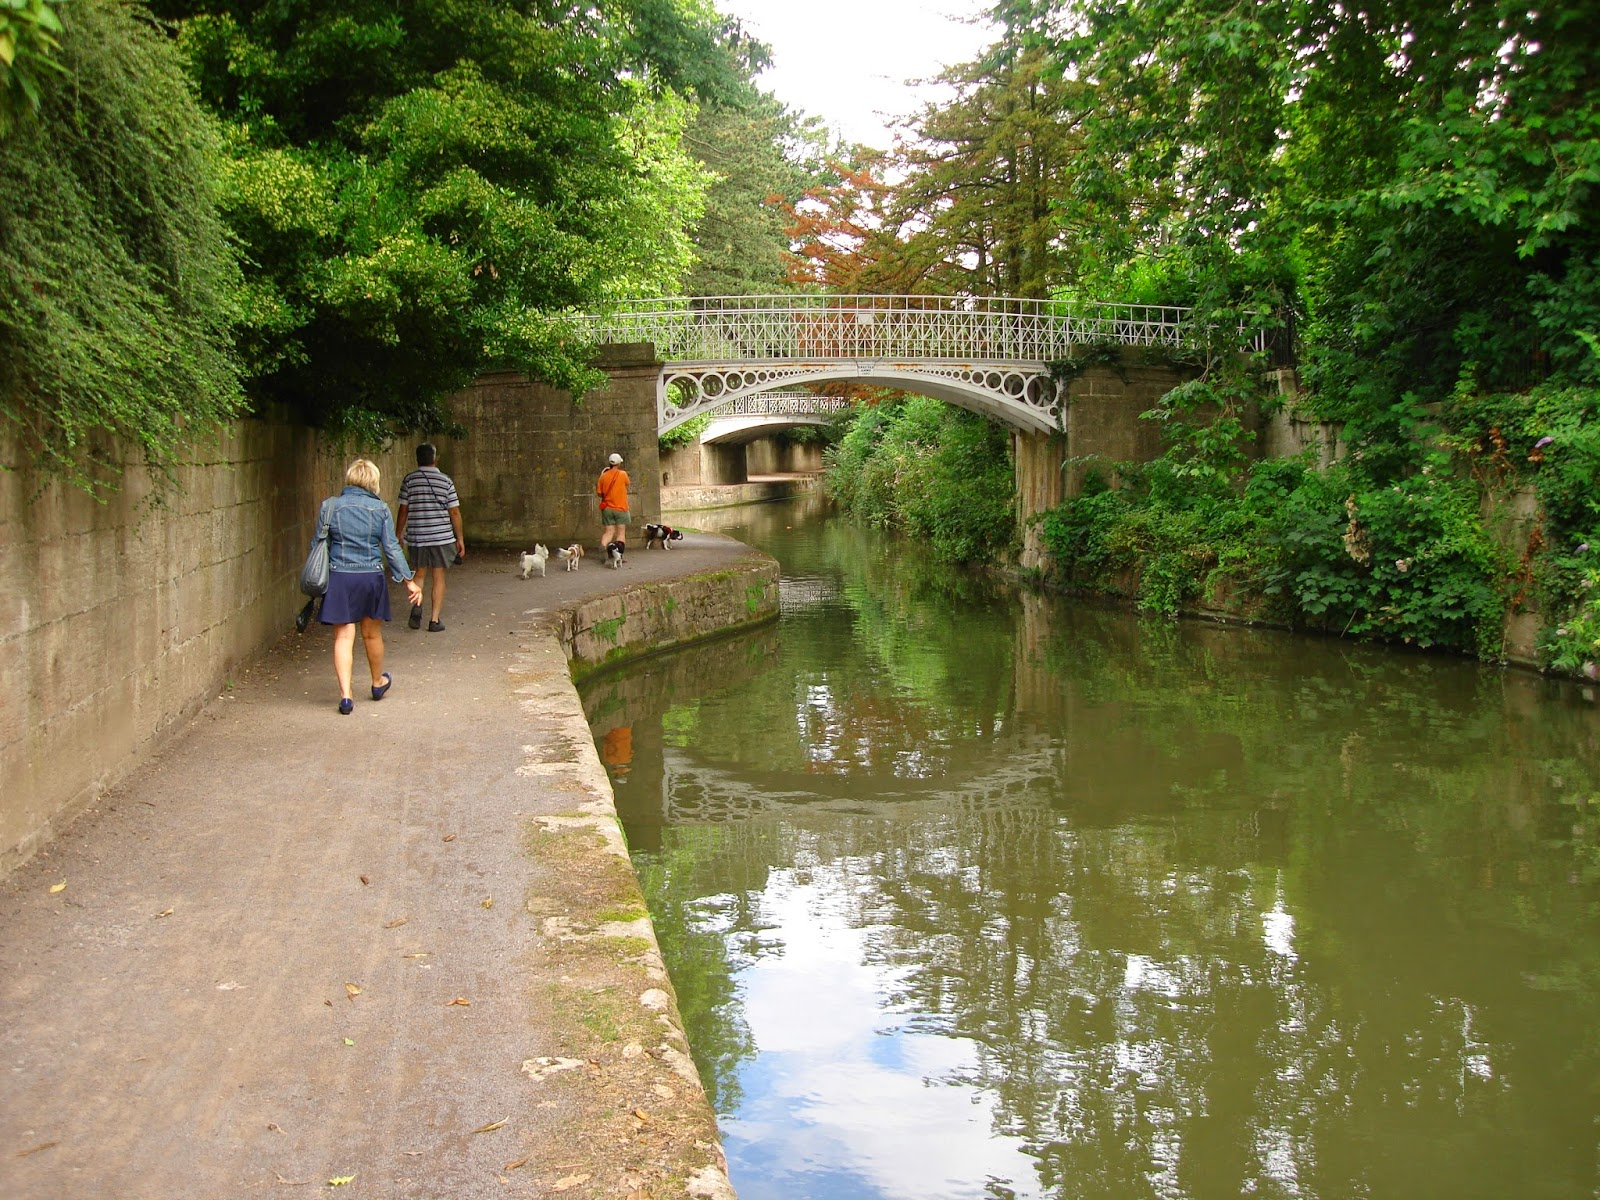 Cast Iron Bridges, Sydney Gardens, Canal